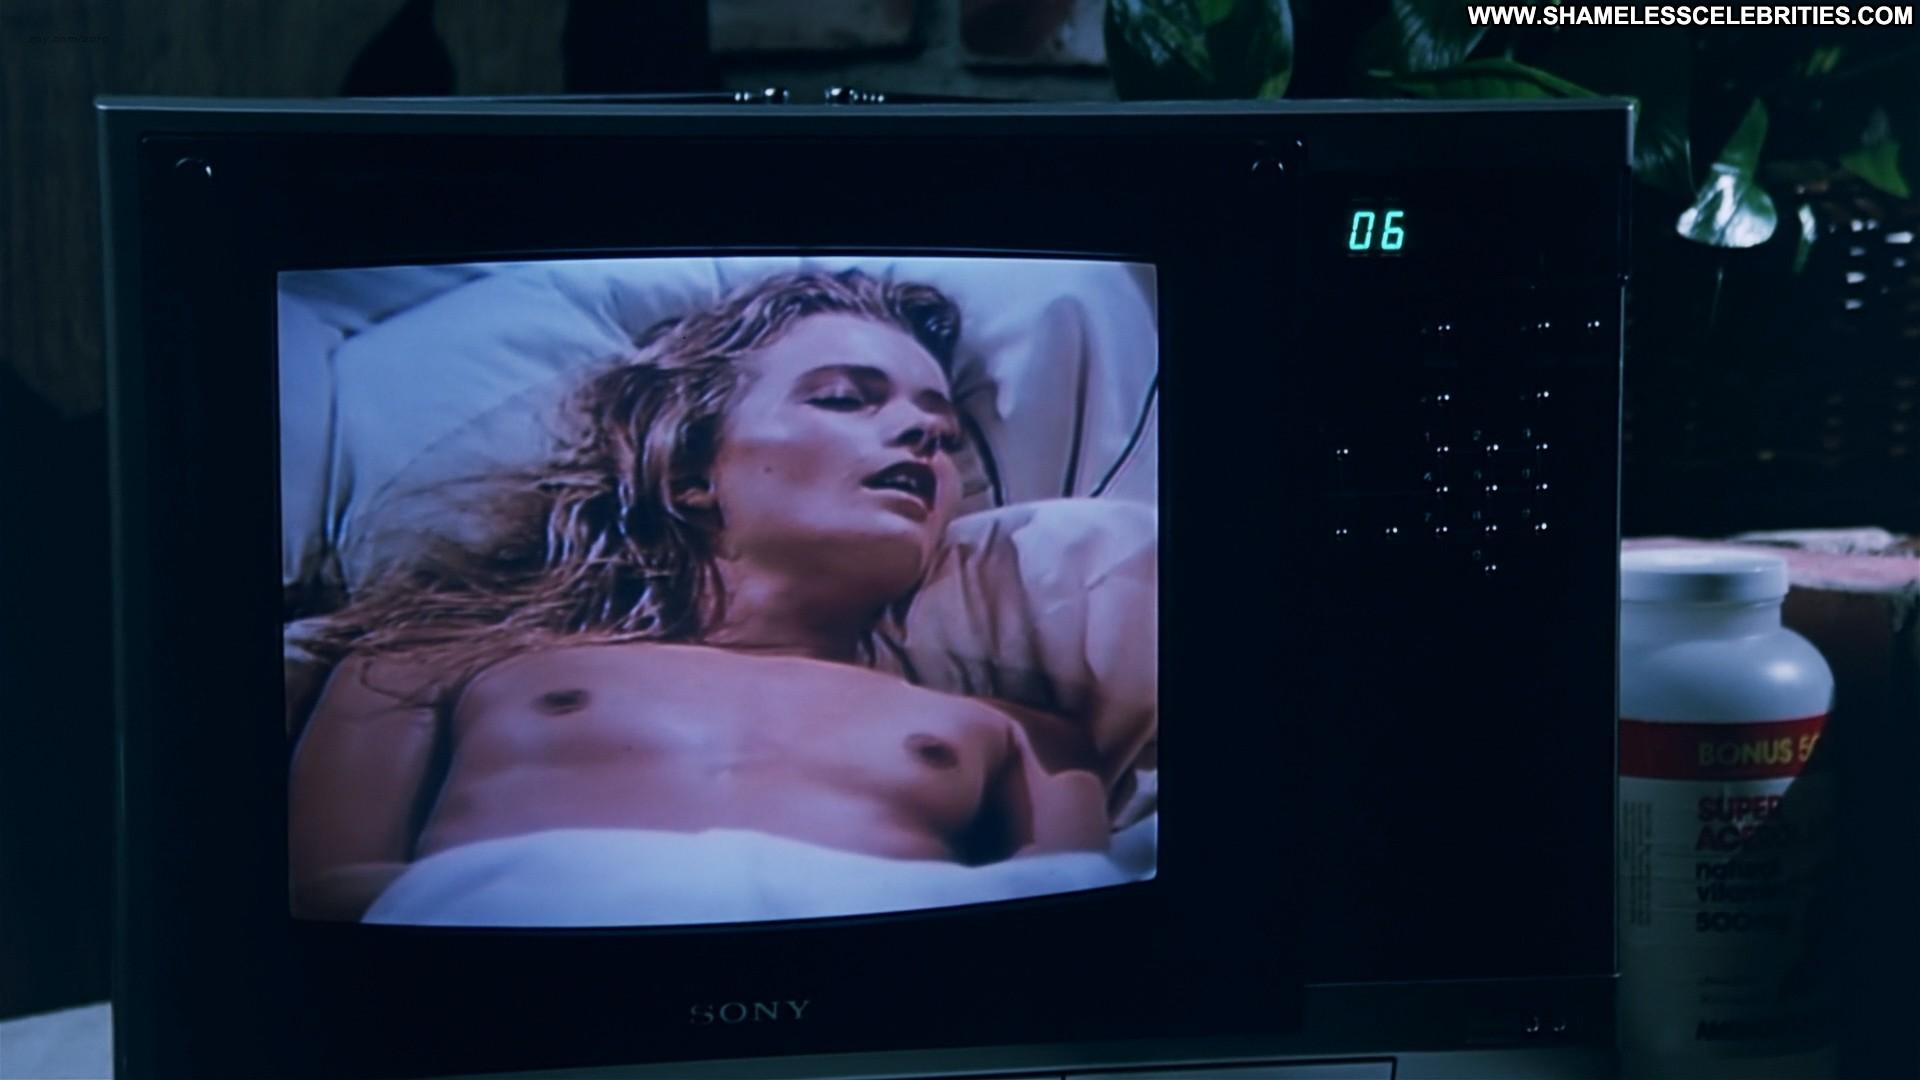 Helen shaver sex tapes